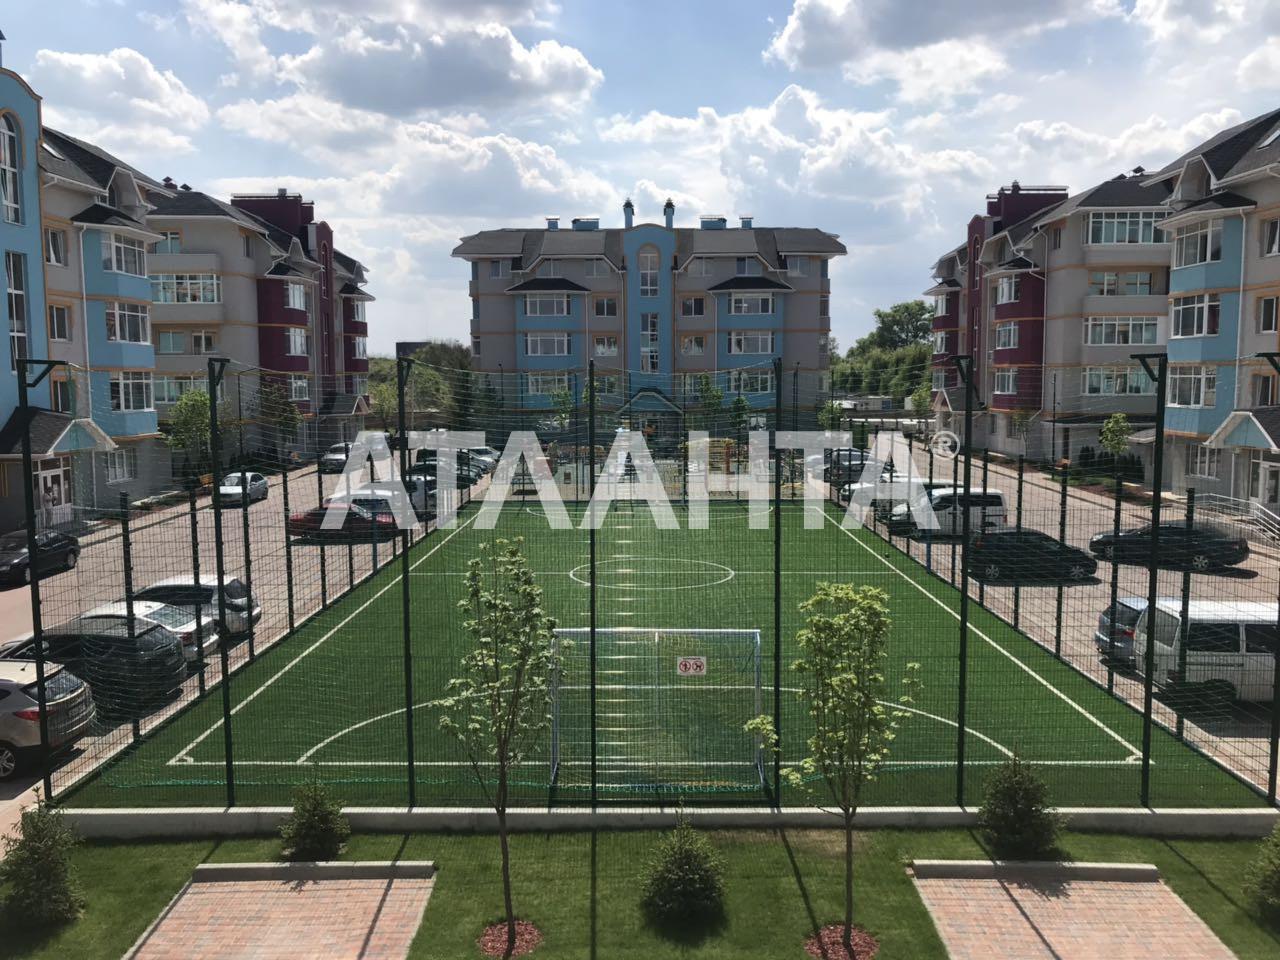 Продается 3-комнатная Квартира на ул. Валовня — 49 000 у.е. (фото №9)